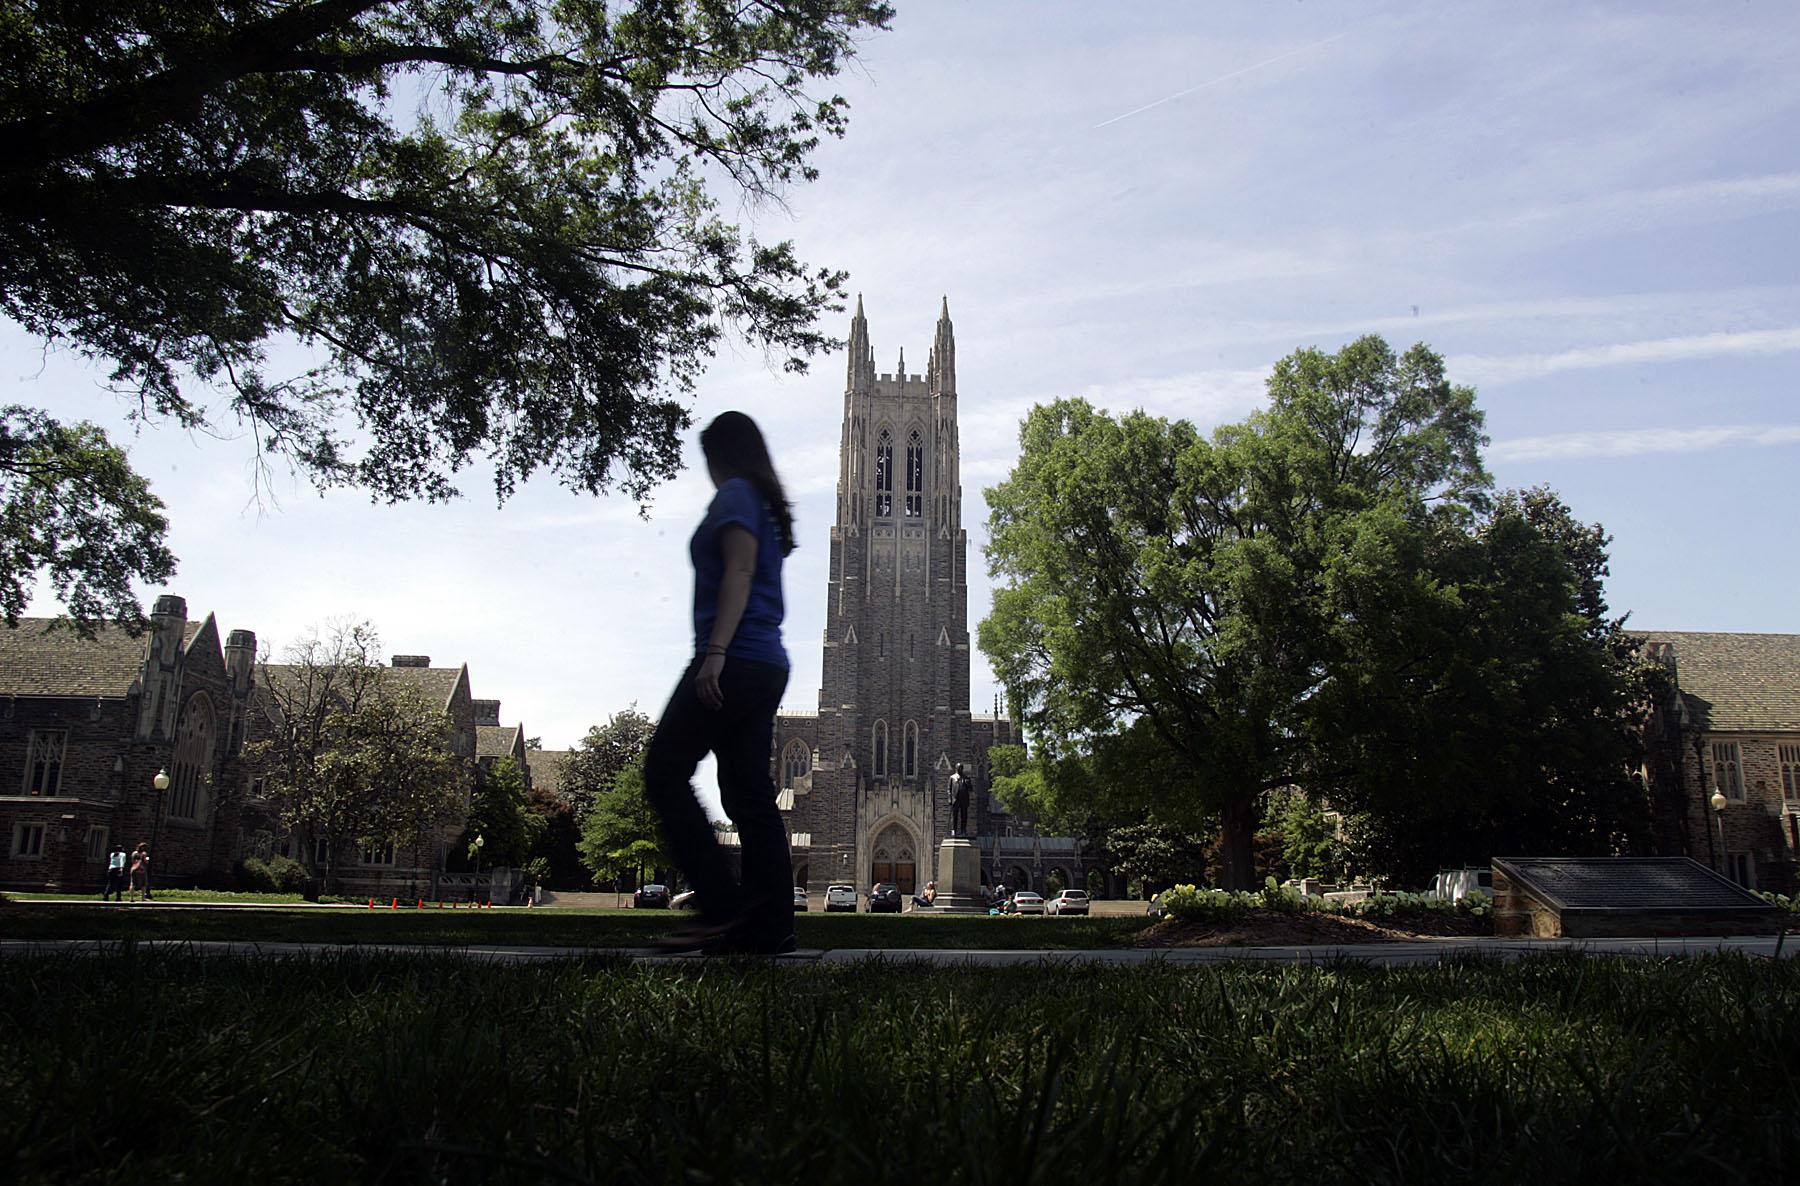 The Duke campus